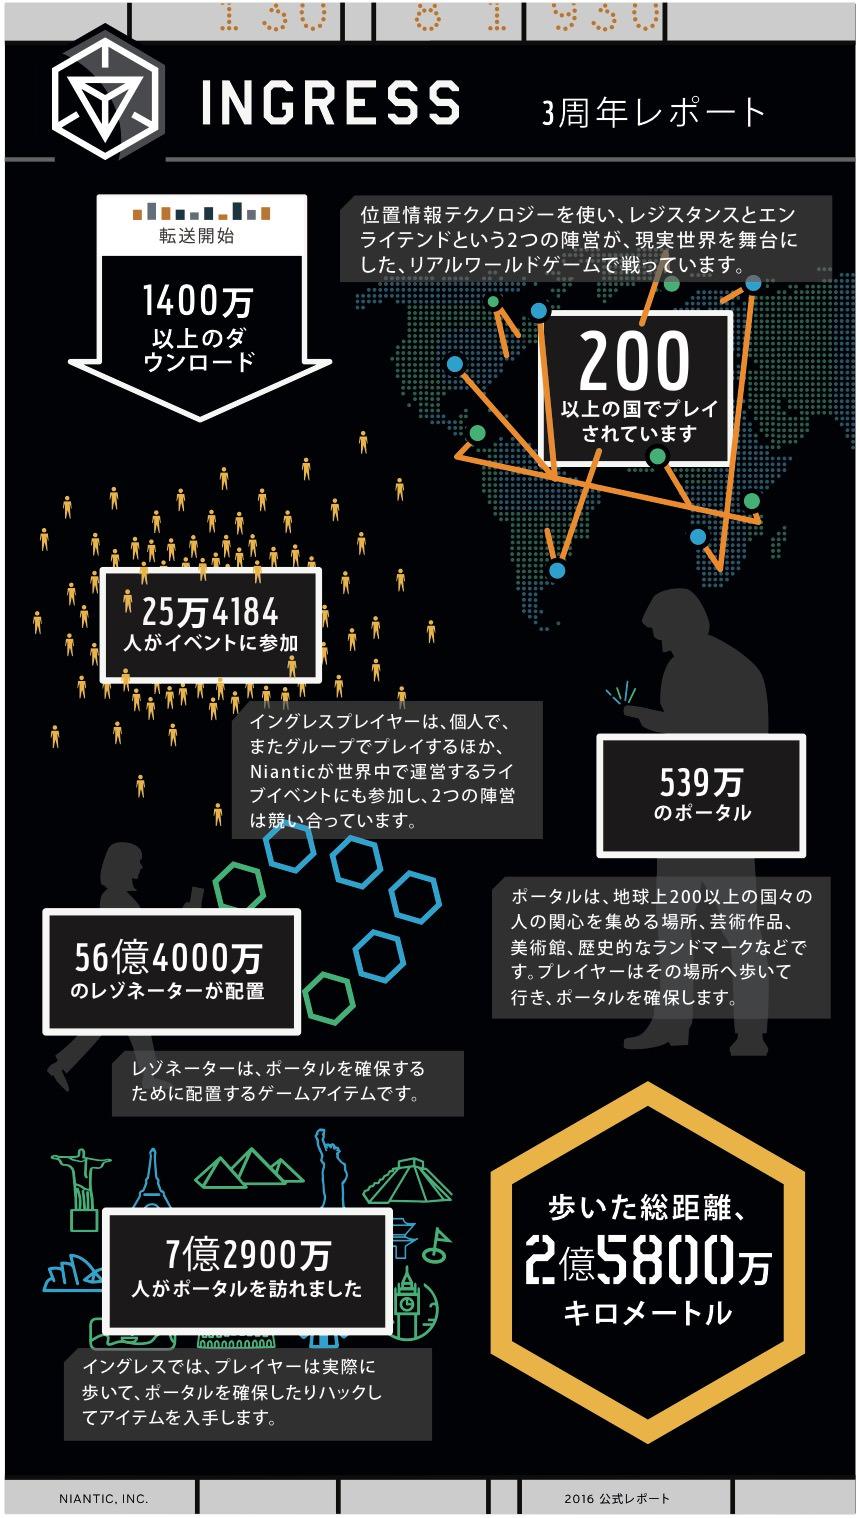 【Ingress】2012年11月のベータ版リリースから3周年を記念したインフォグラフィックを公開 → ダウンロード数は1,400万以上、歩いた総距離は2億5,800万km